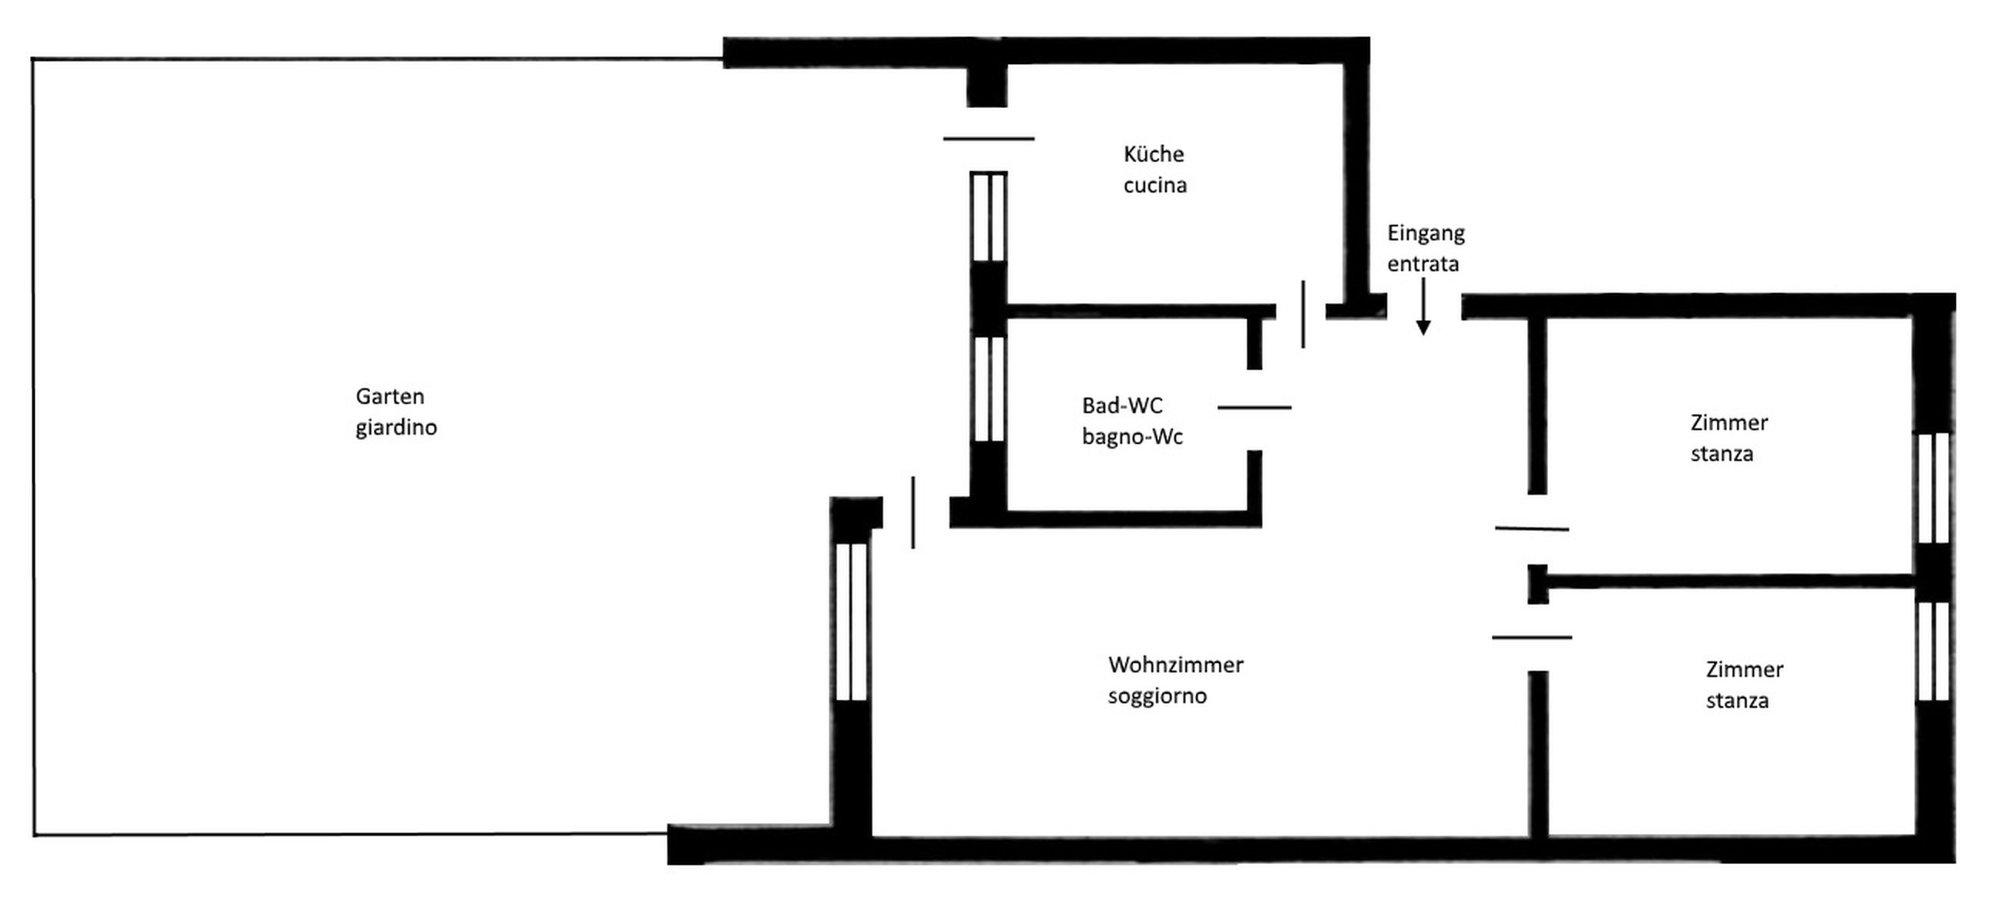 Plan Wohnung_piantina appartamento